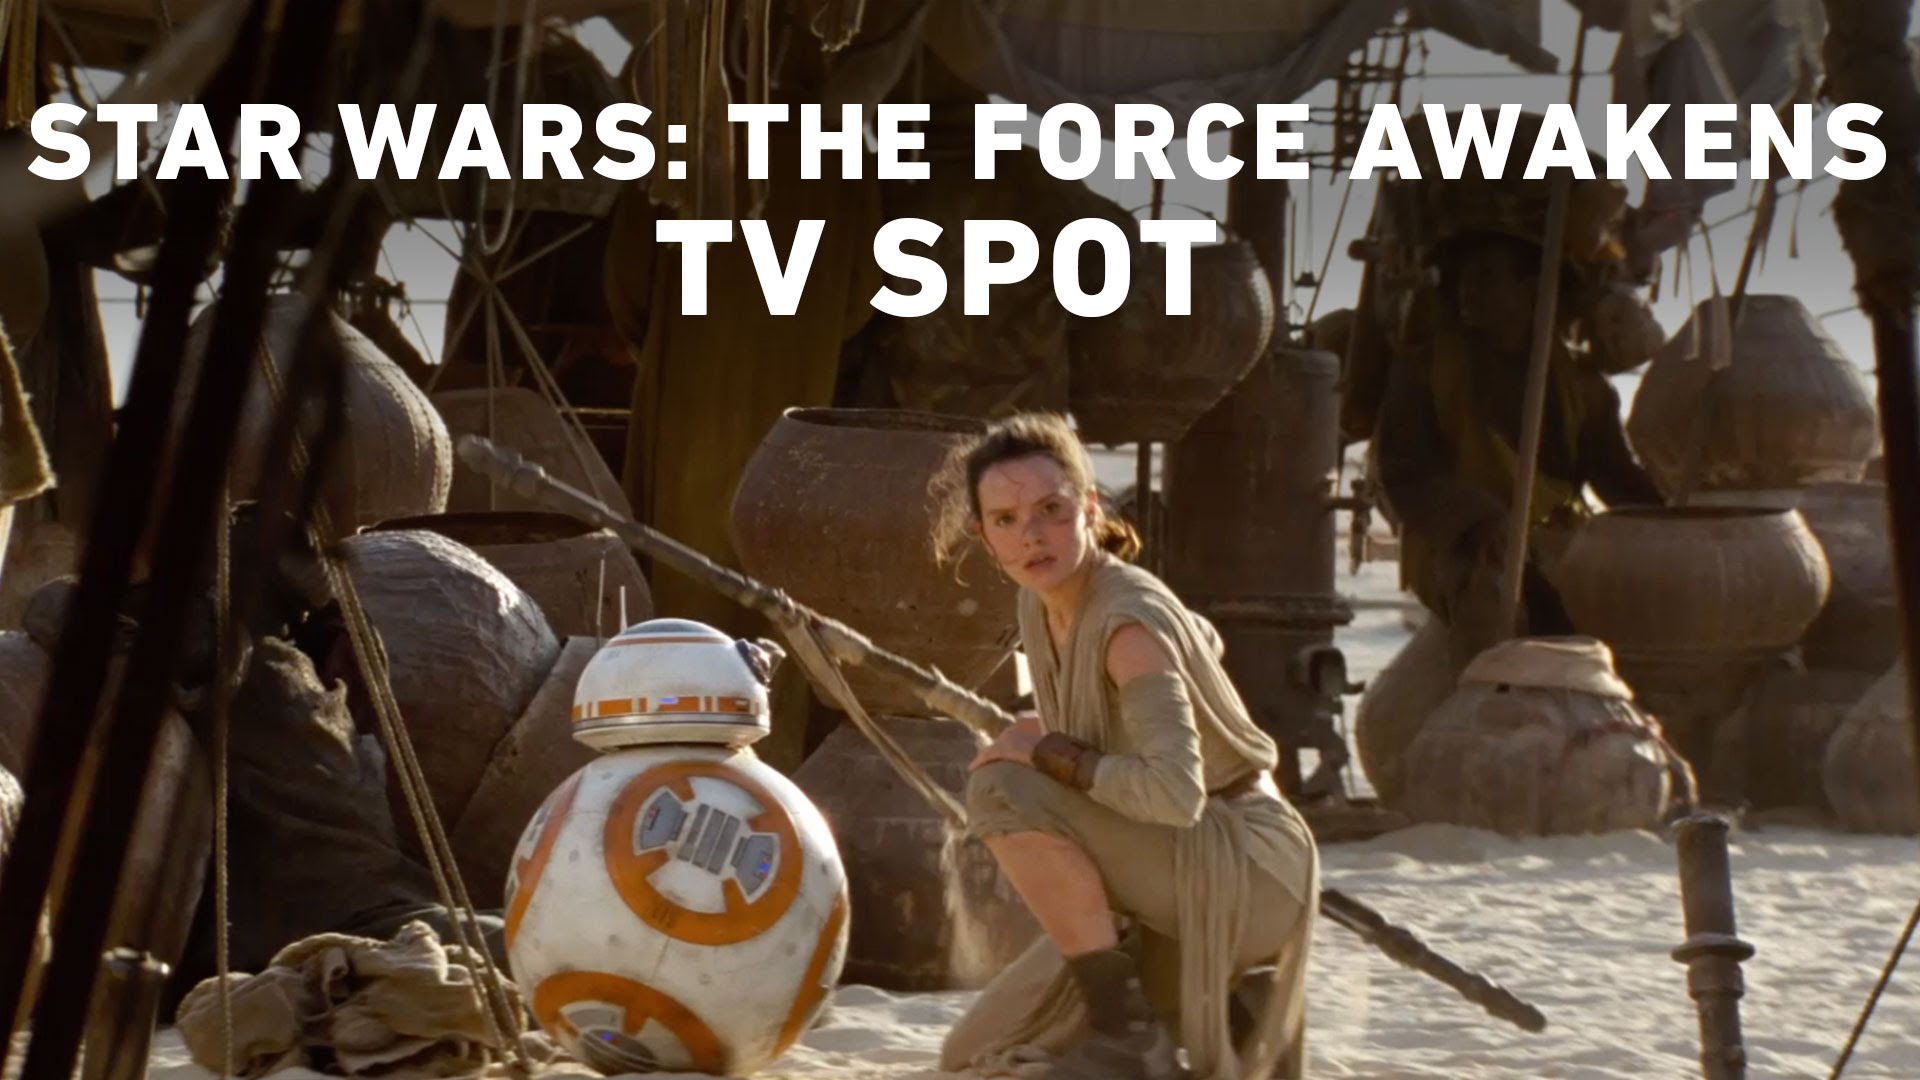 Star Wars: The Force Awakens TV Spot (Official)